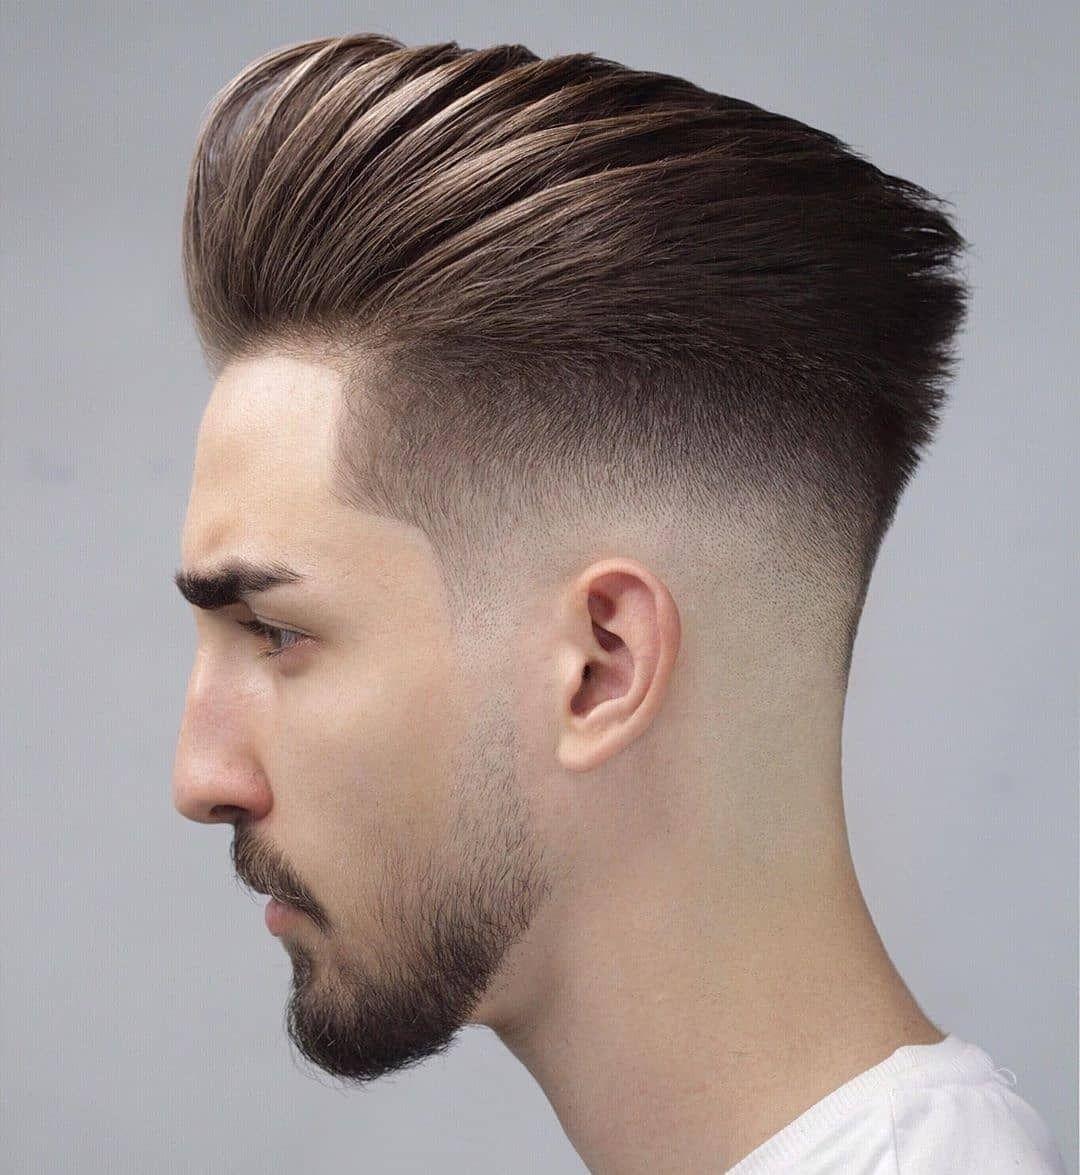 Mensfashion Vip Hair Haircut Barber Barbers Barbershop Menshair Menslook Hairstyle Low Fade Haircut Mens Hairstyles Fade Trending Hairstyles For Men